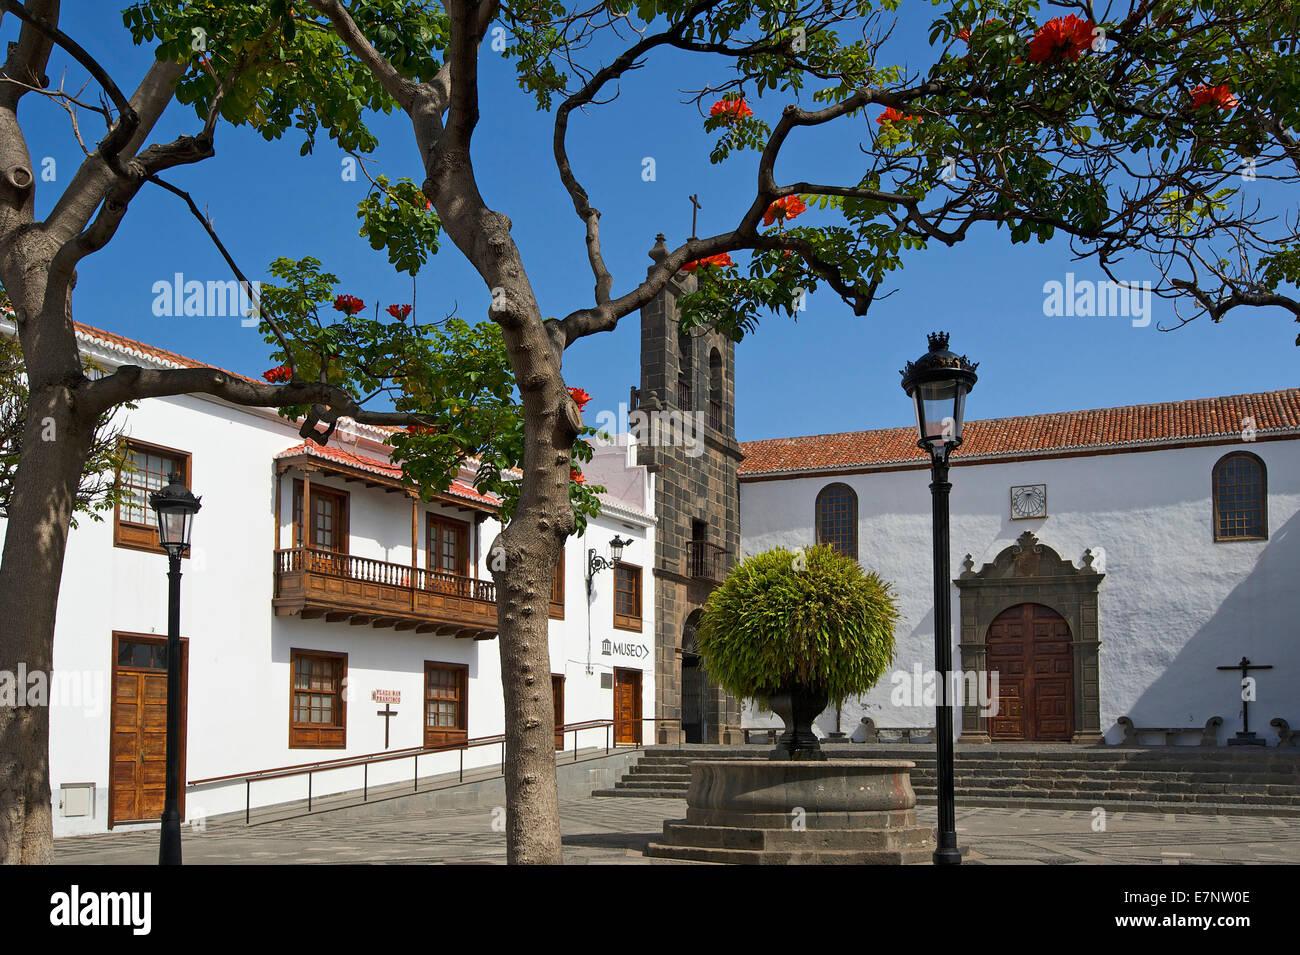 Kanaren, Kanarische Inseln, Inseln, La Palma, Spanien, Europa, draußen, Tag, niemand, Franziskaner Kloster, Stockbild